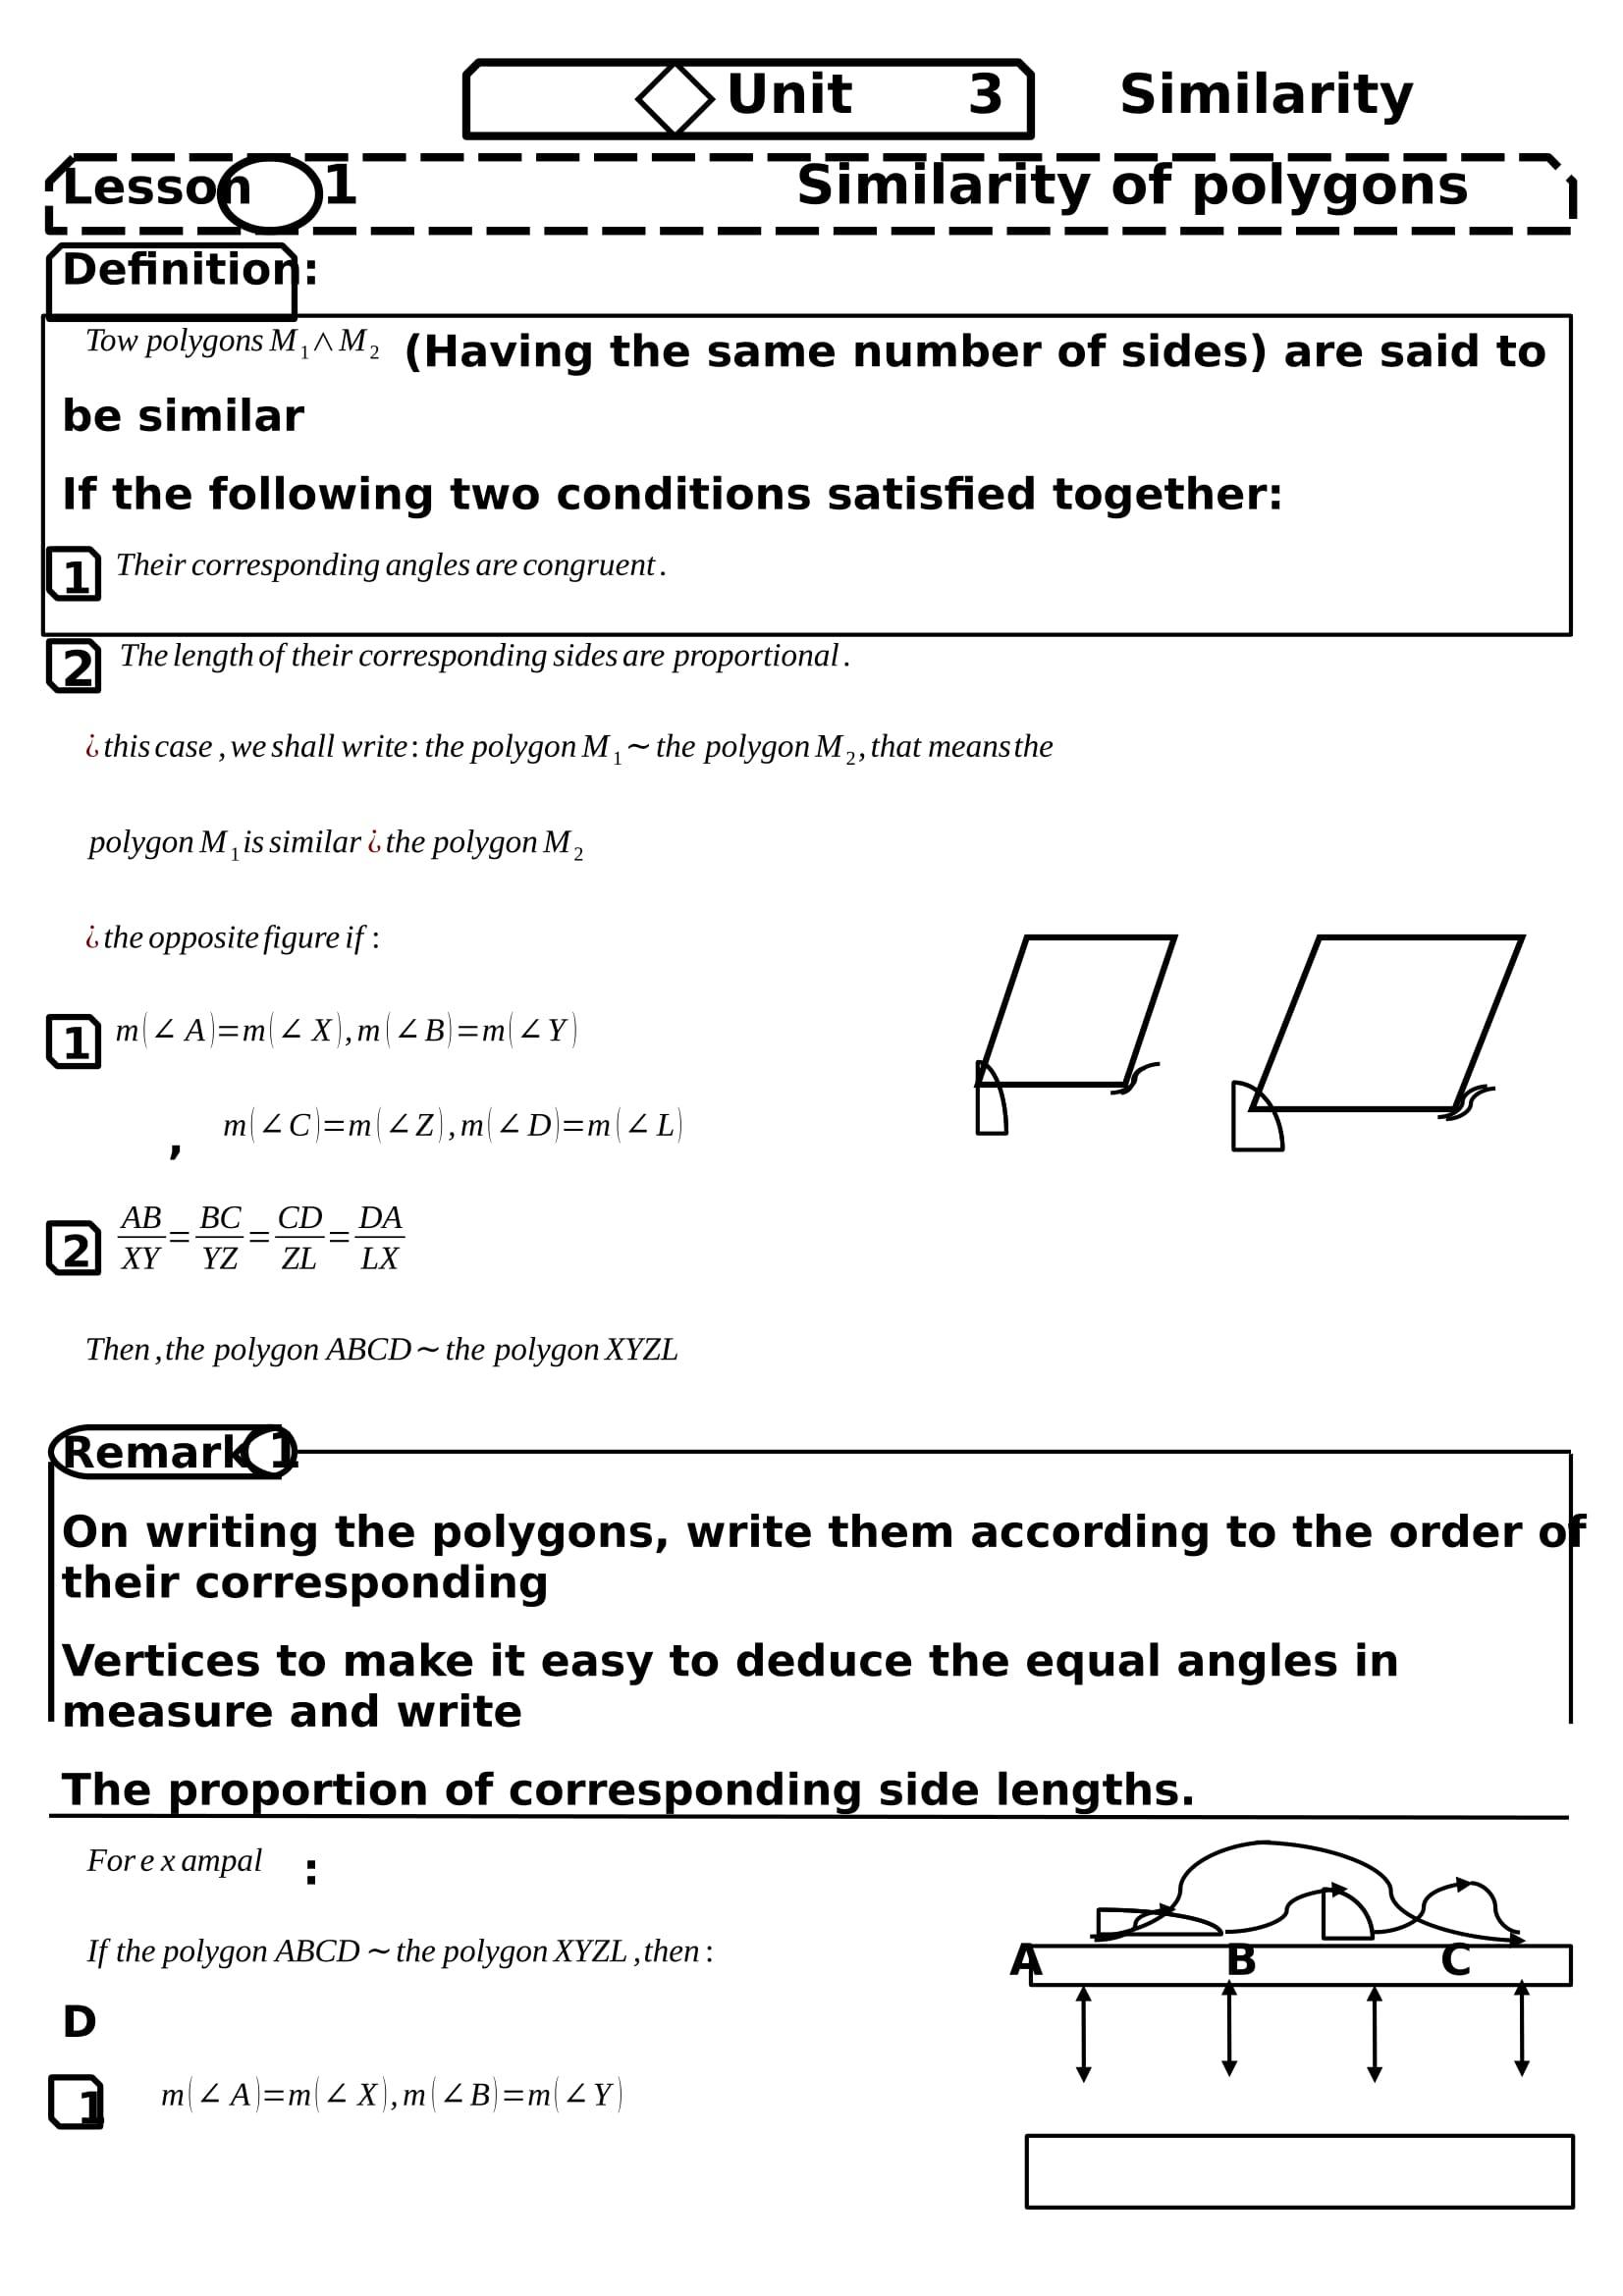 exam-eg.com_1511271331861.jpg